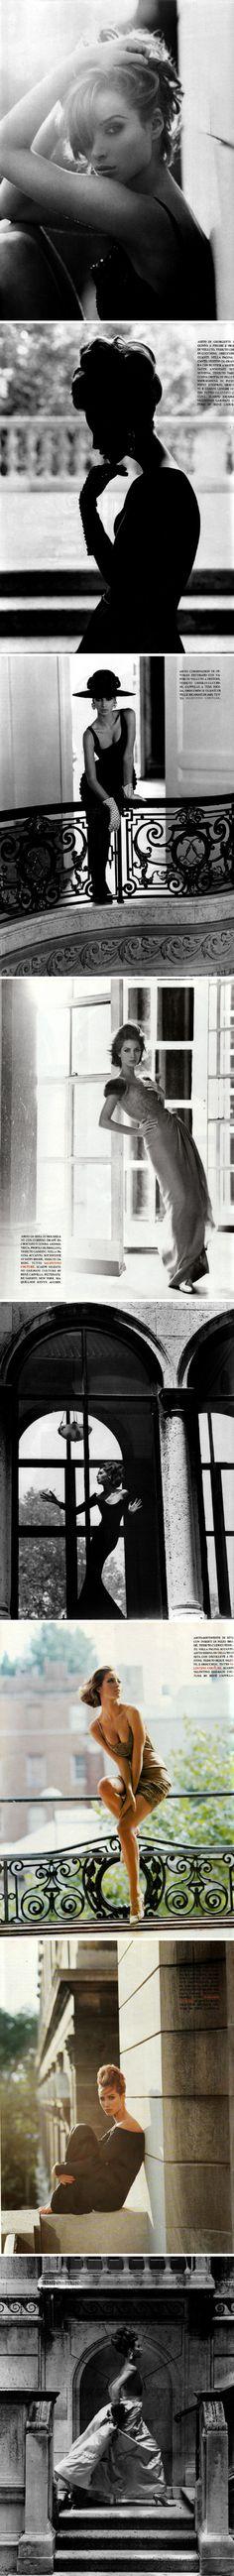 Christy Turlington by Steven Meisel for Vogue Italia.